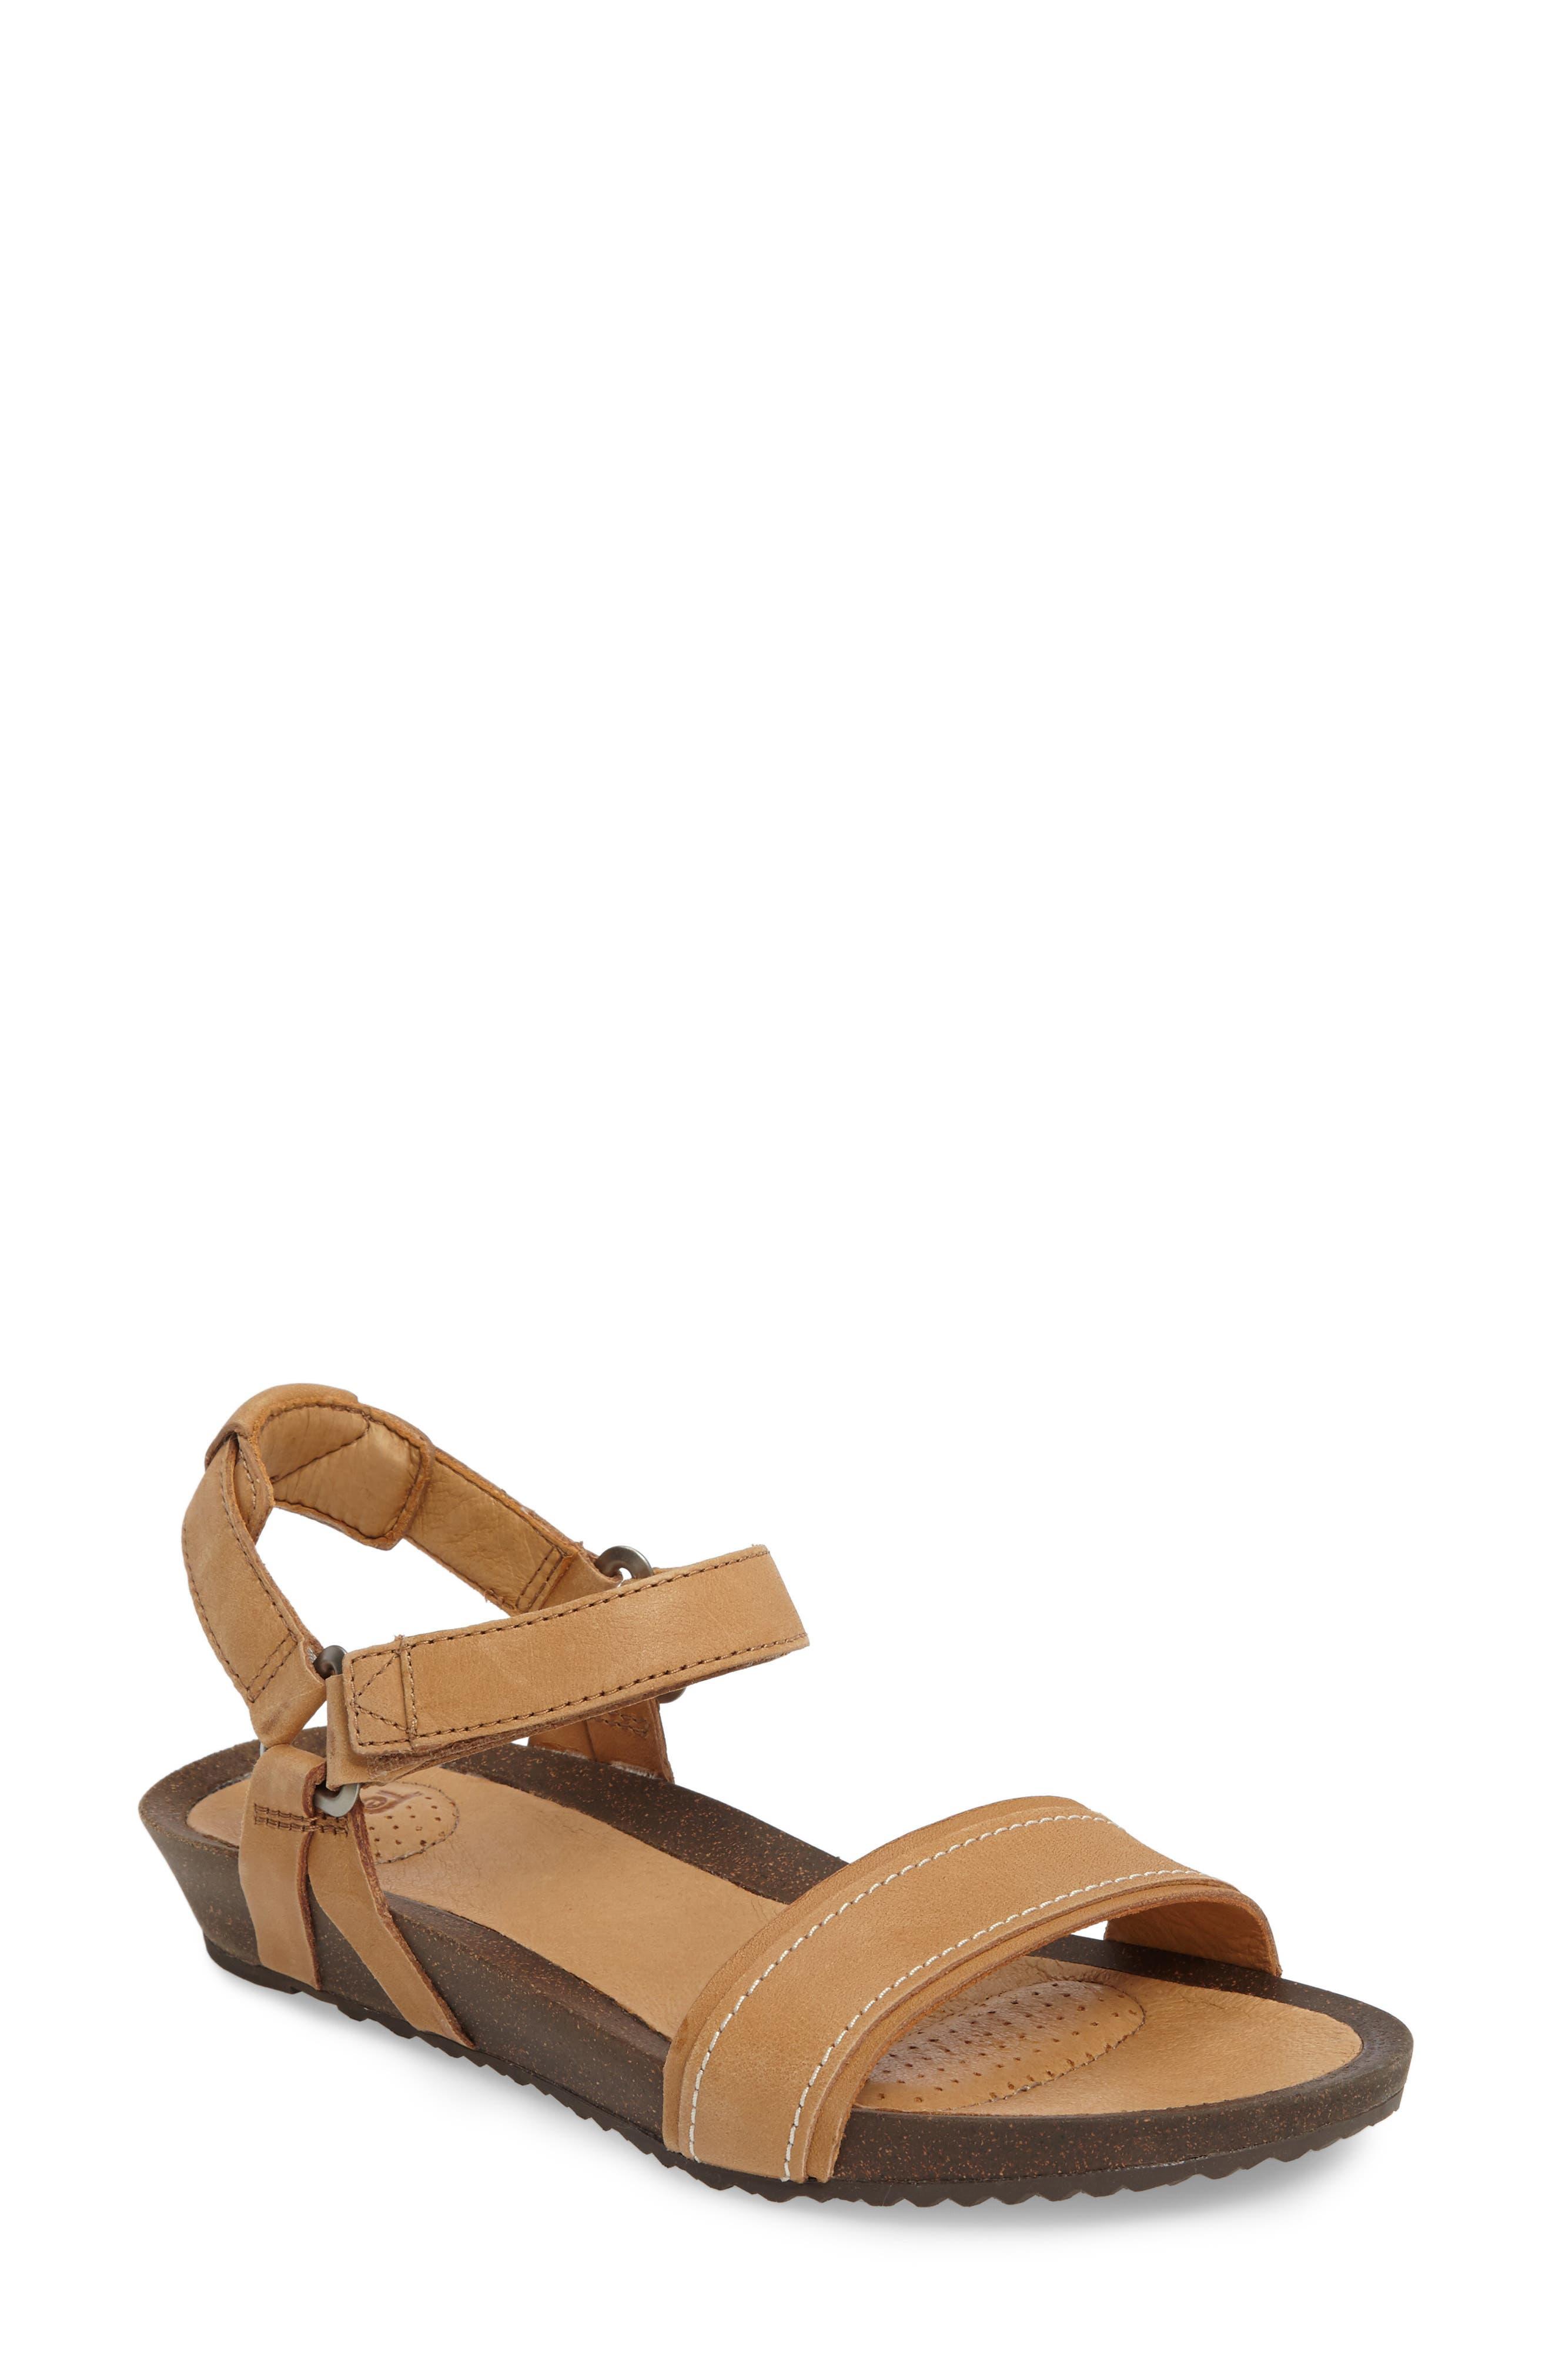 Ysidro Stitch Sandal,                             Main thumbnail 1, color,                             Tan Leather